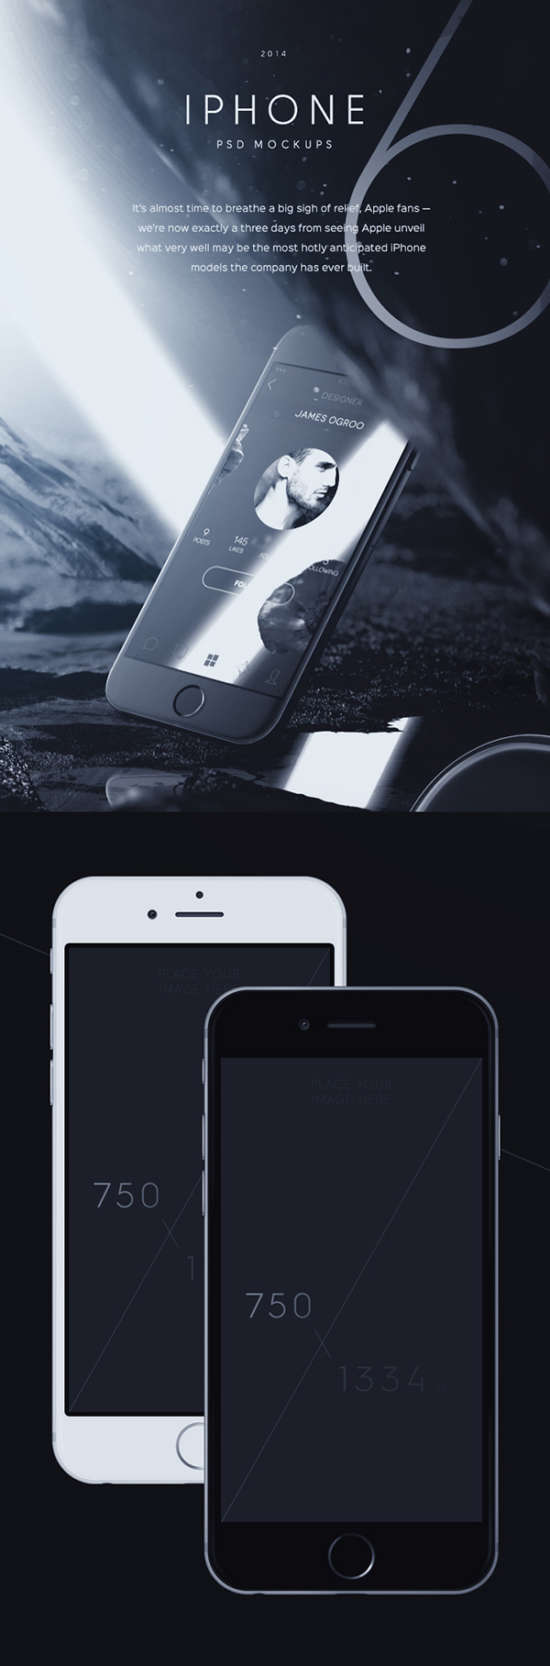 free_iphone_6_mockups